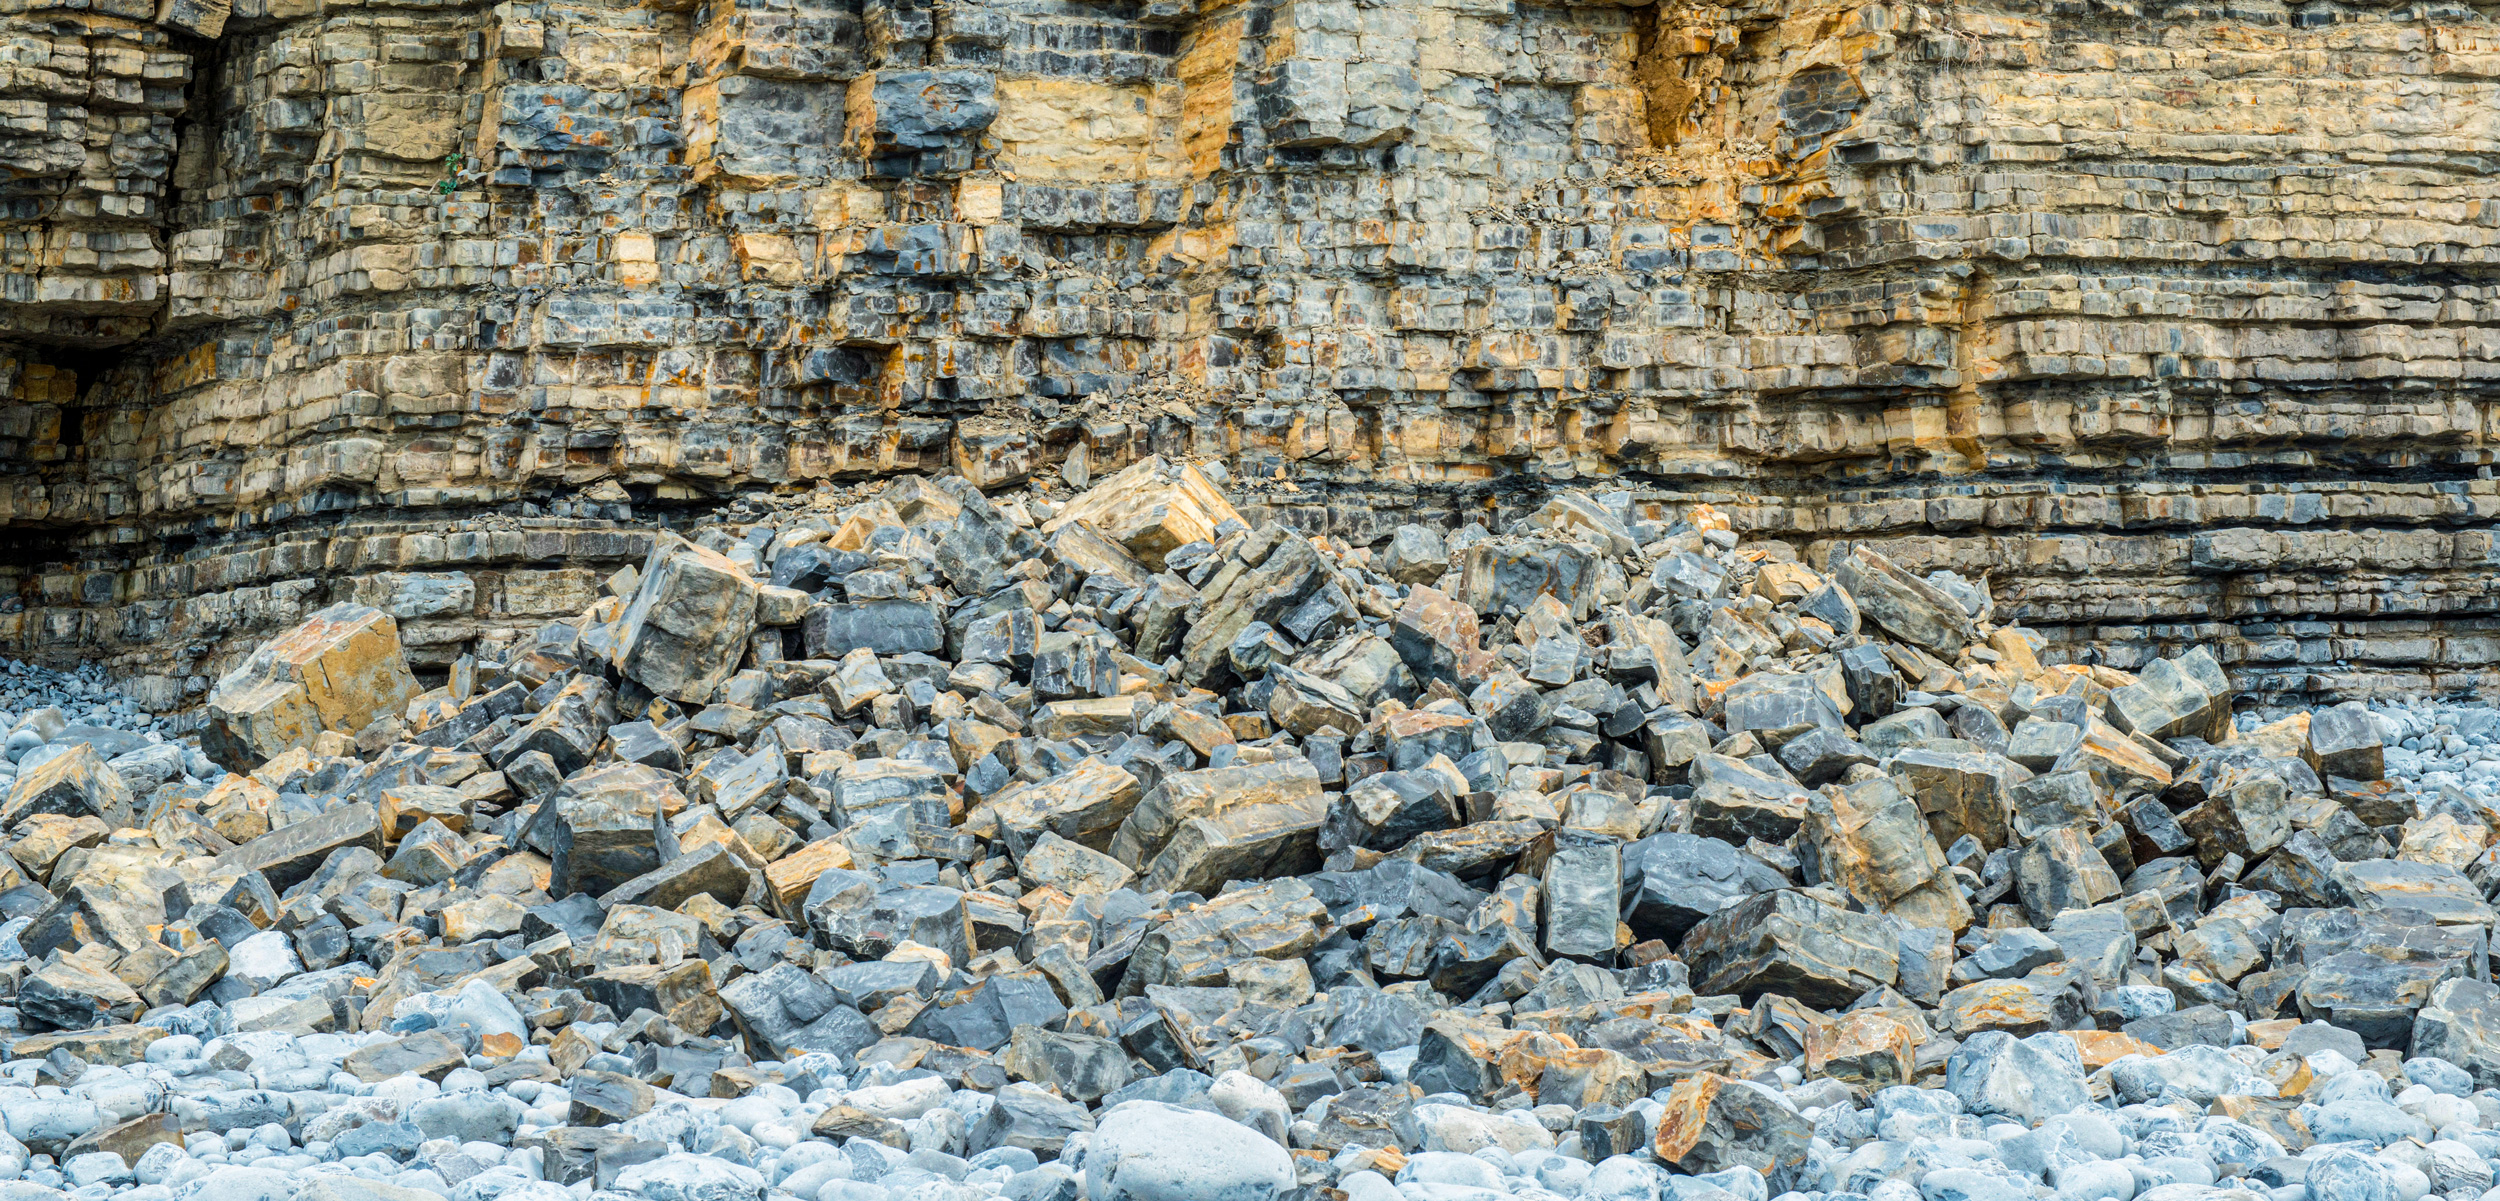 Rockfall at the Oolitic Limestone Cliffs on the Glamorgan Heritage Coast South Wales